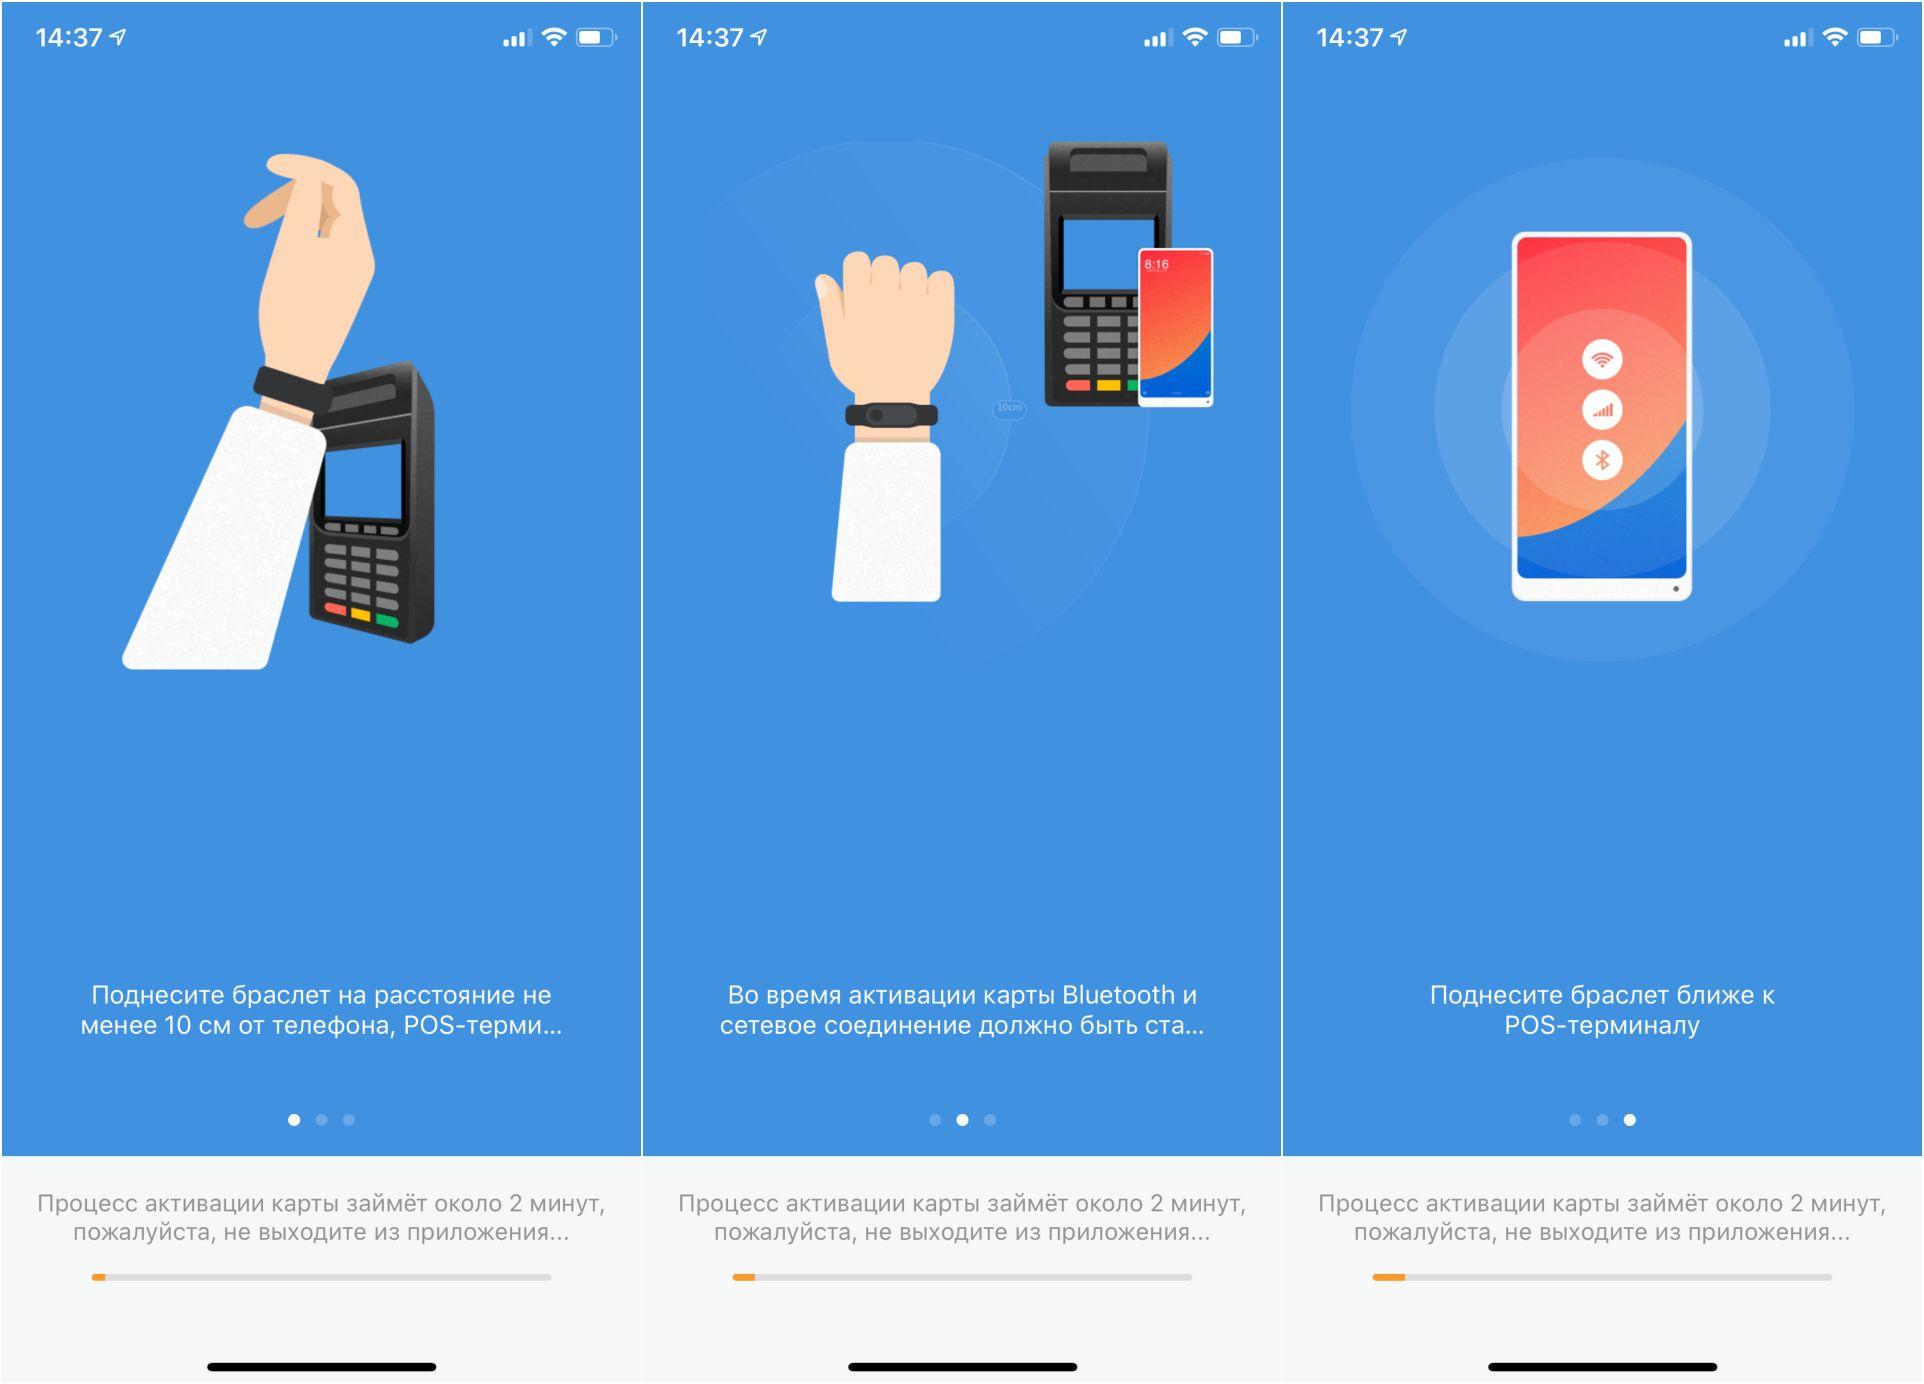 How to just buy shawarma using Xiaomi Mi Smart Band 4 NFC